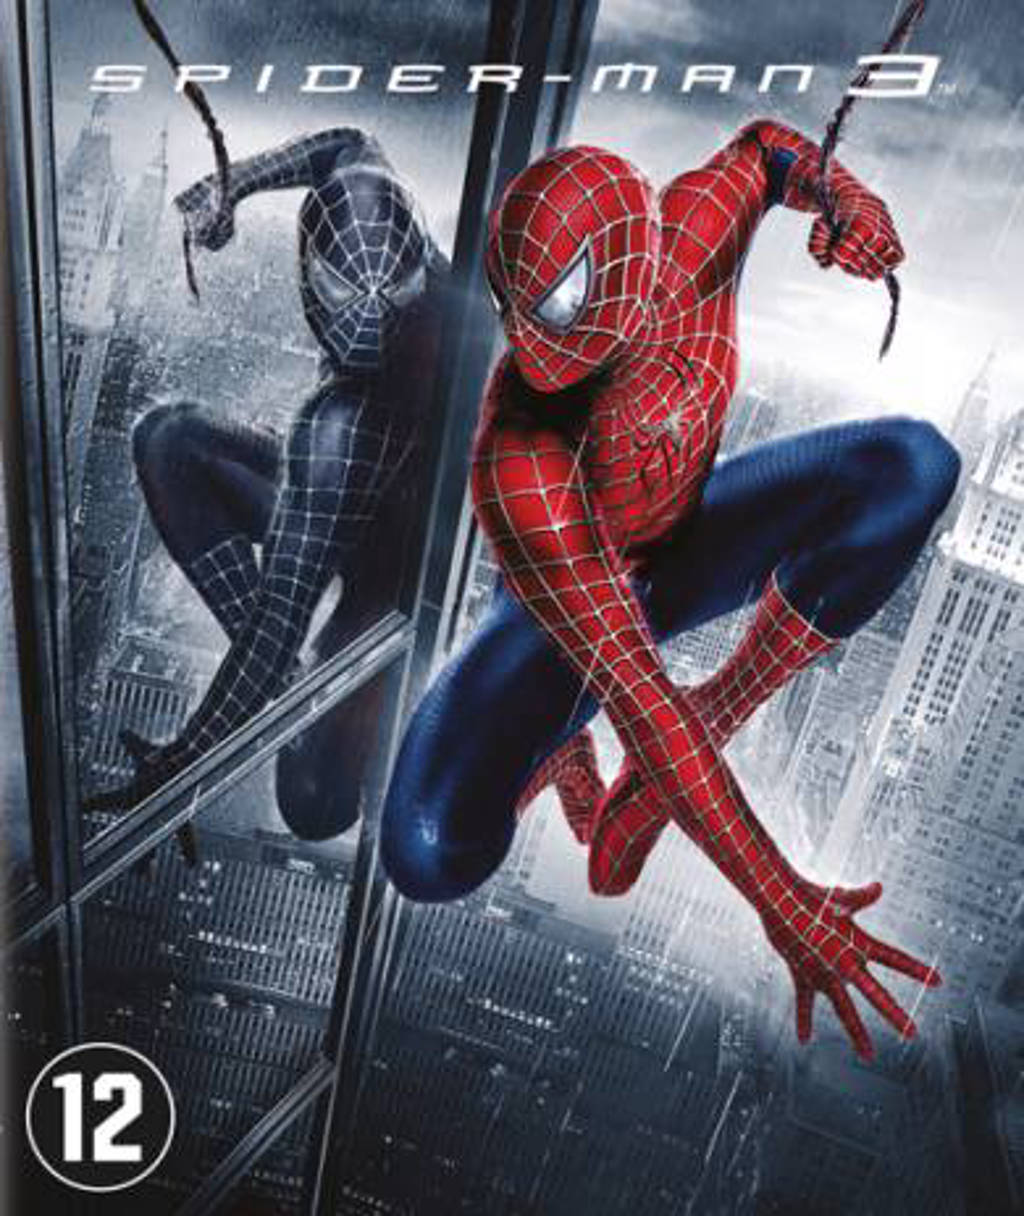 Spider-man 3 (Collectors edition)  (Blu-ray)